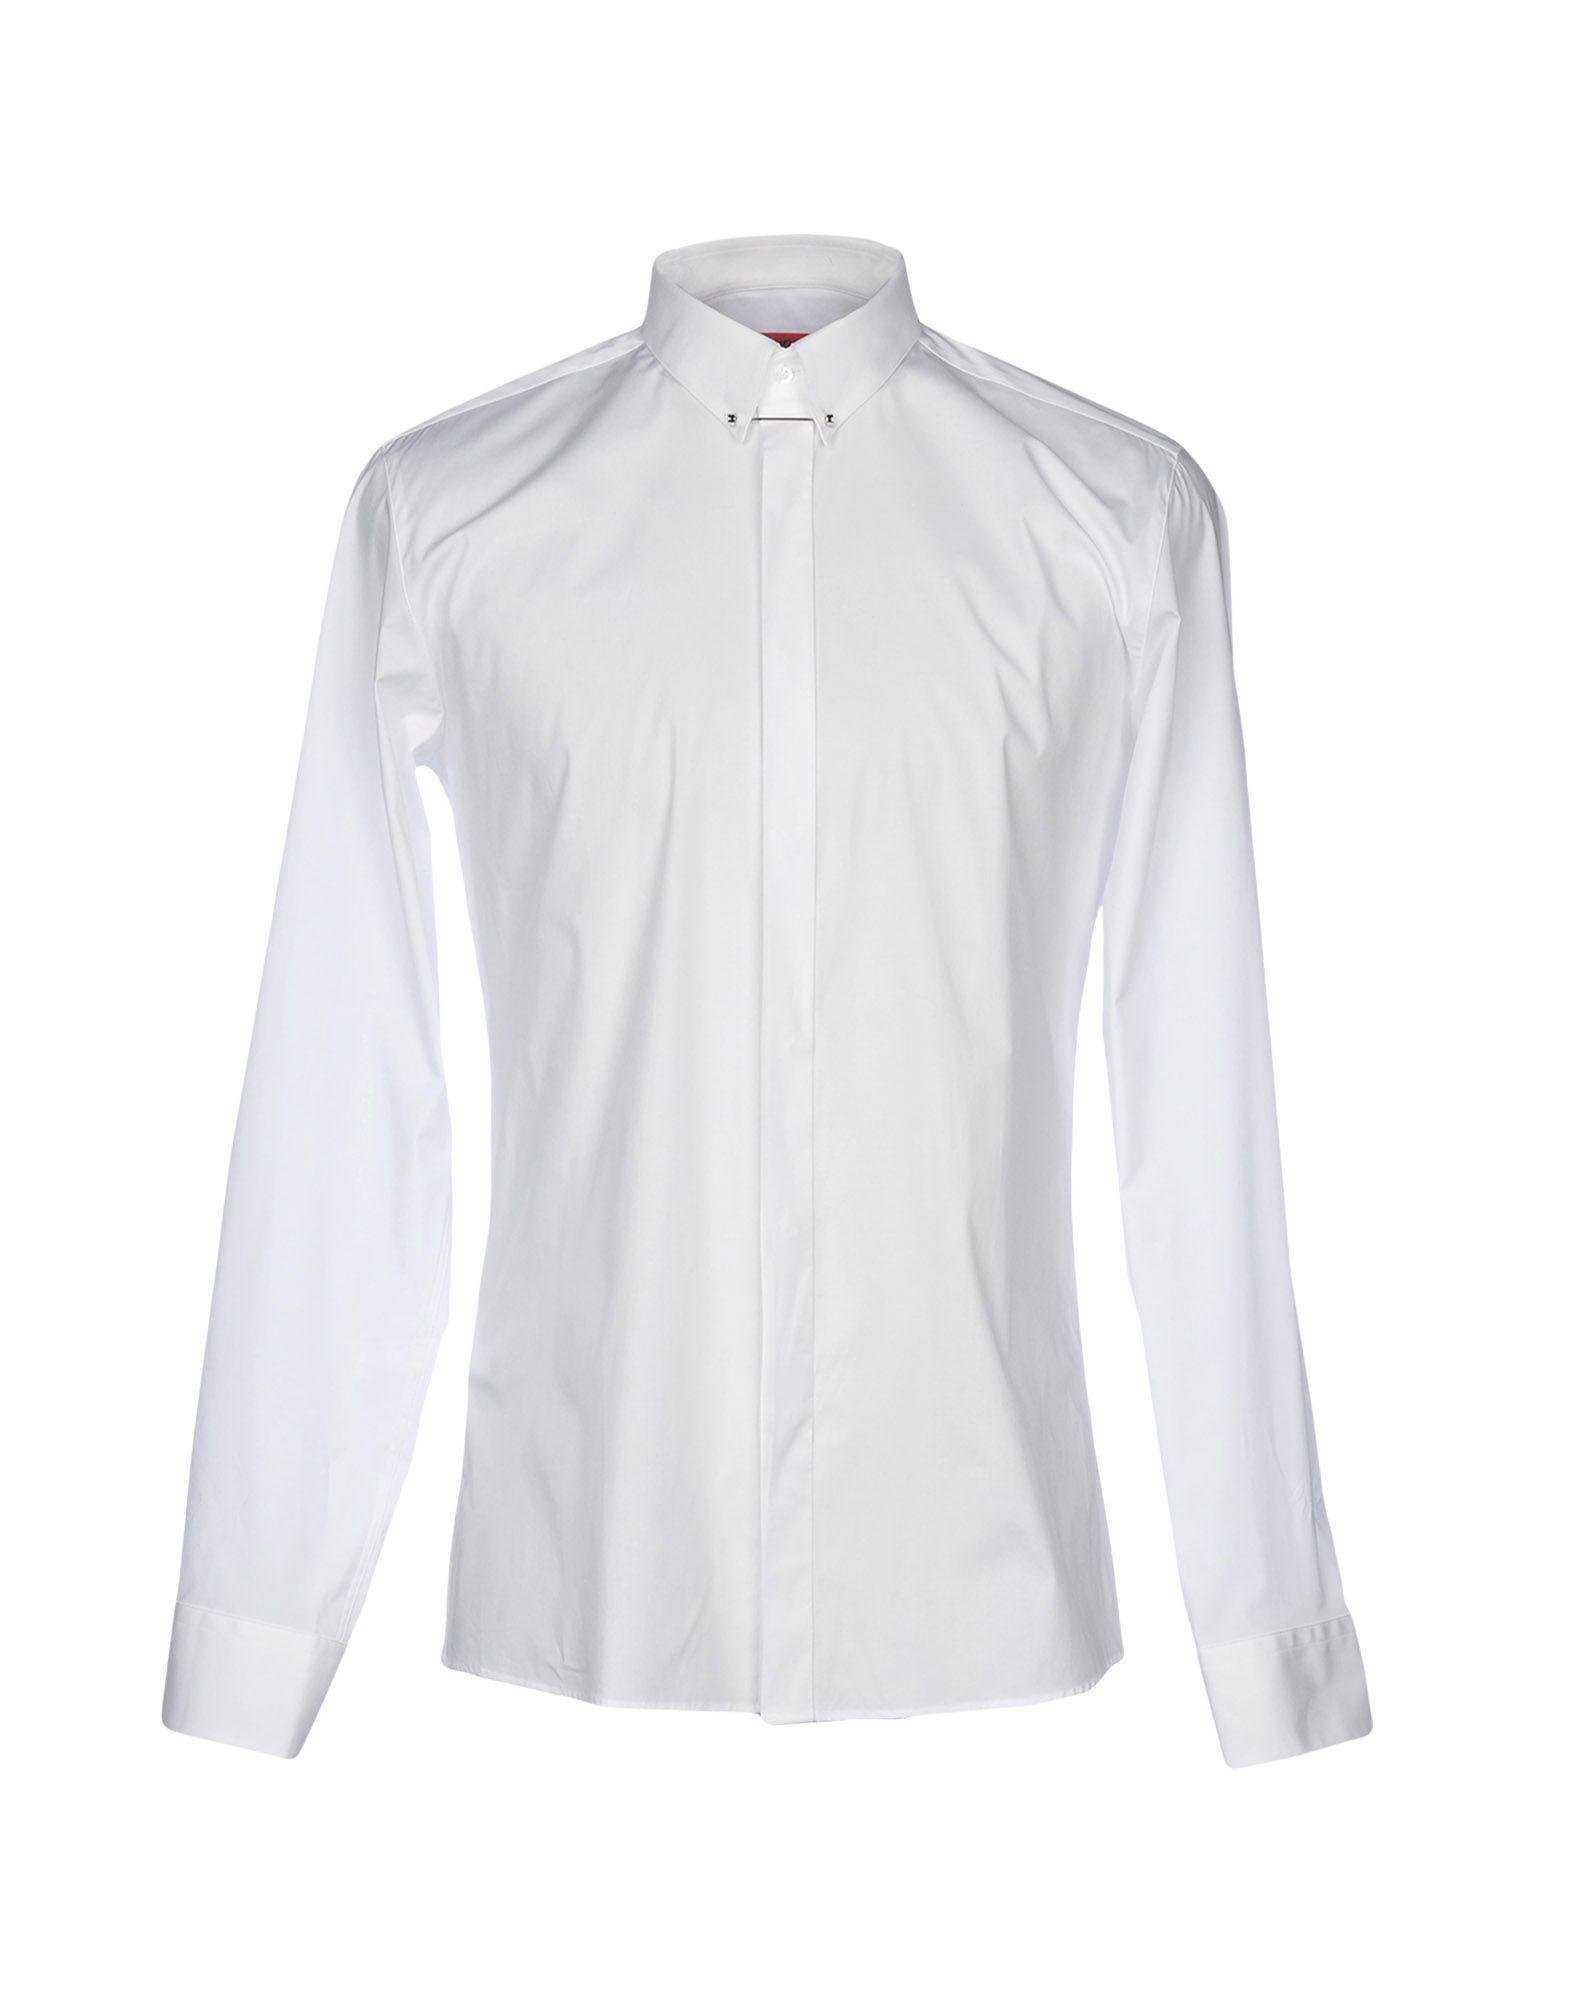 Camicia Tinta Unita Unita Tinta Hugo Uomo - 38762372ER c25b8b